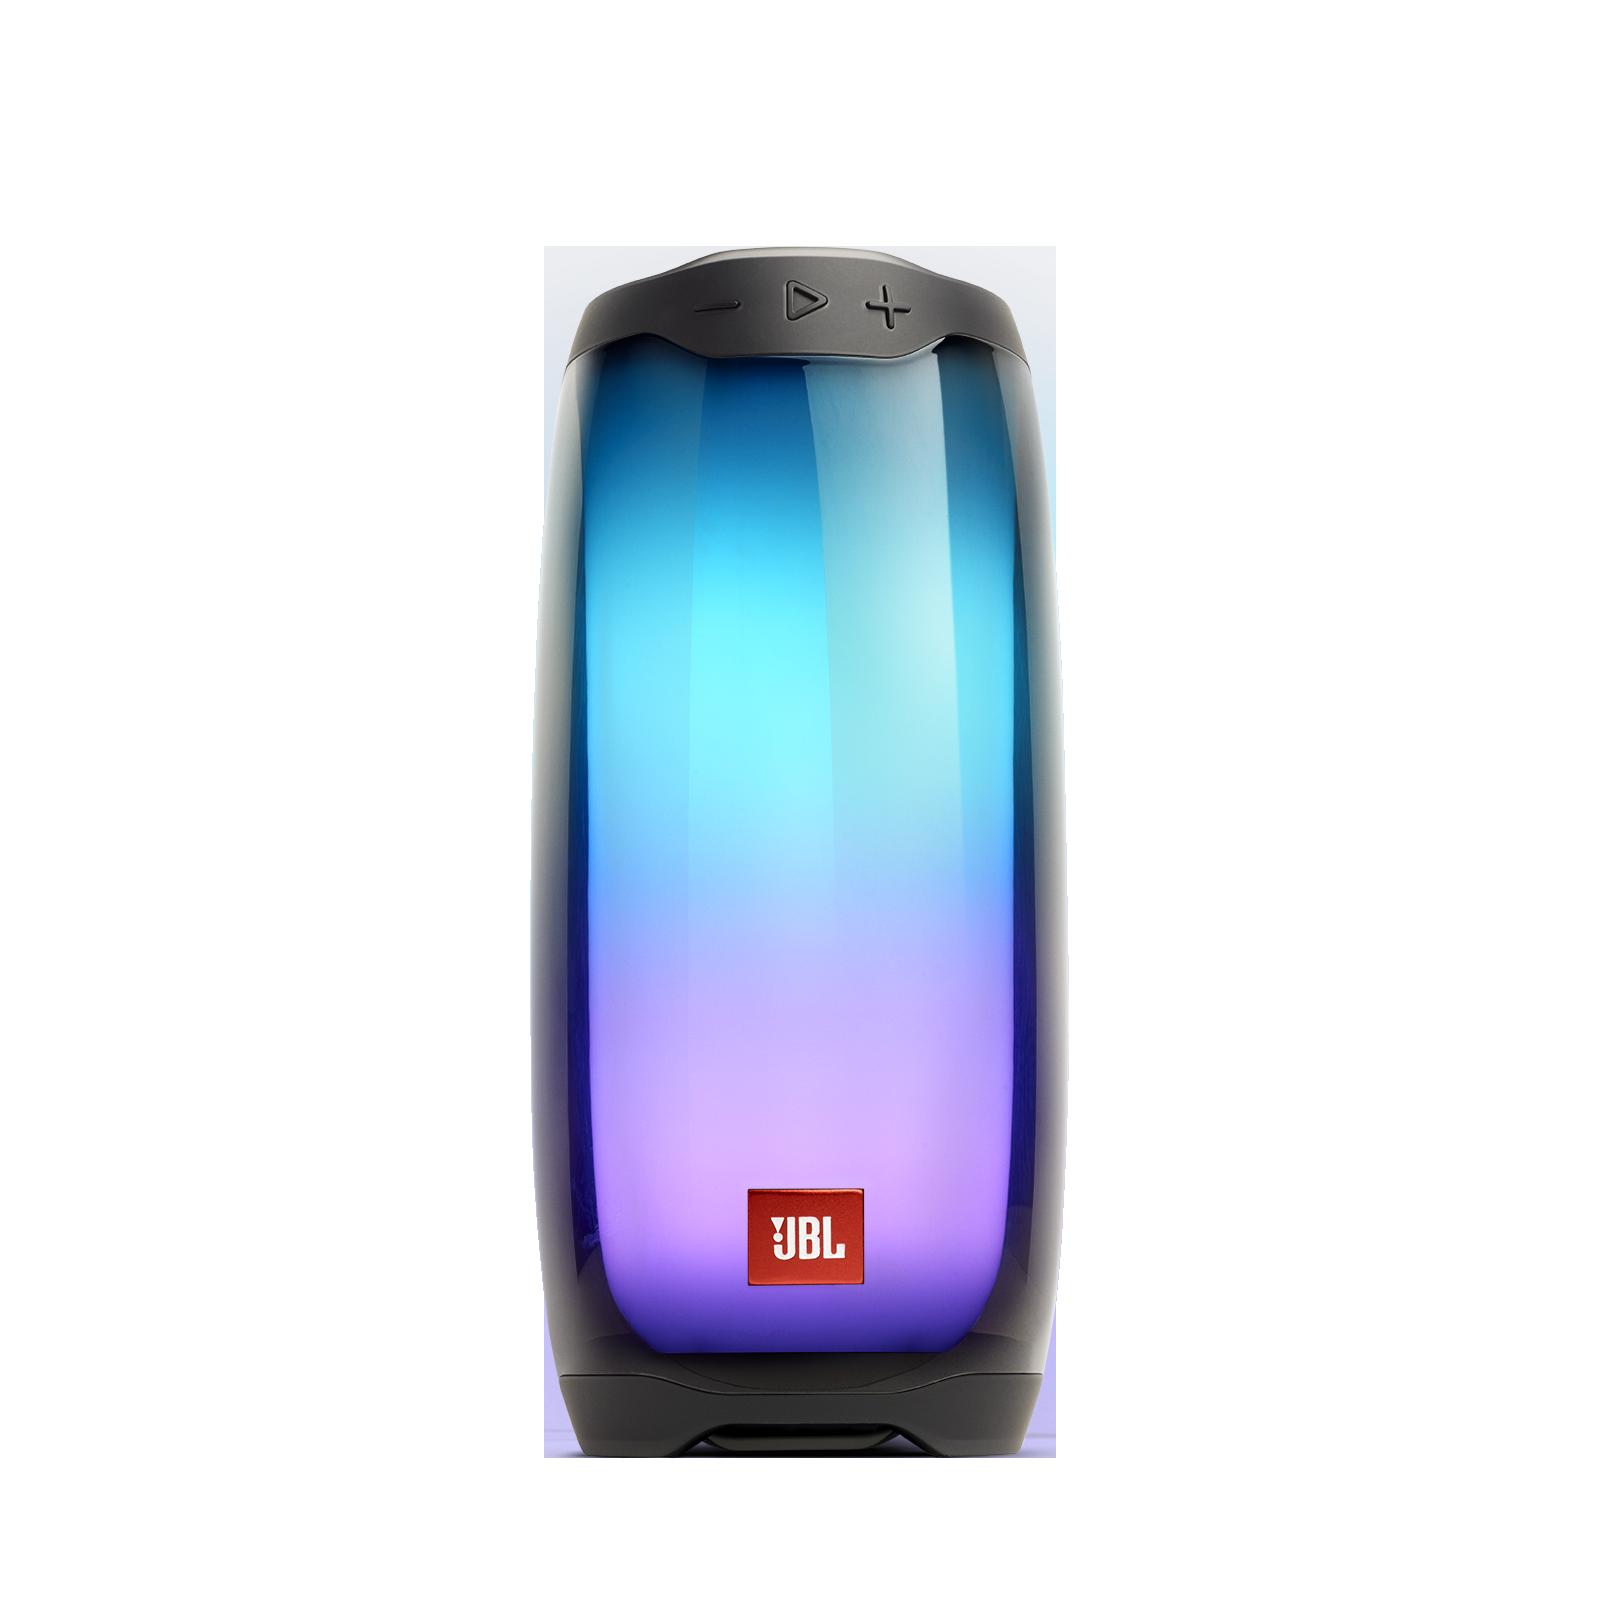 JBL Pulse 4 - Black - Portable Bluetooth Speaker - Hero